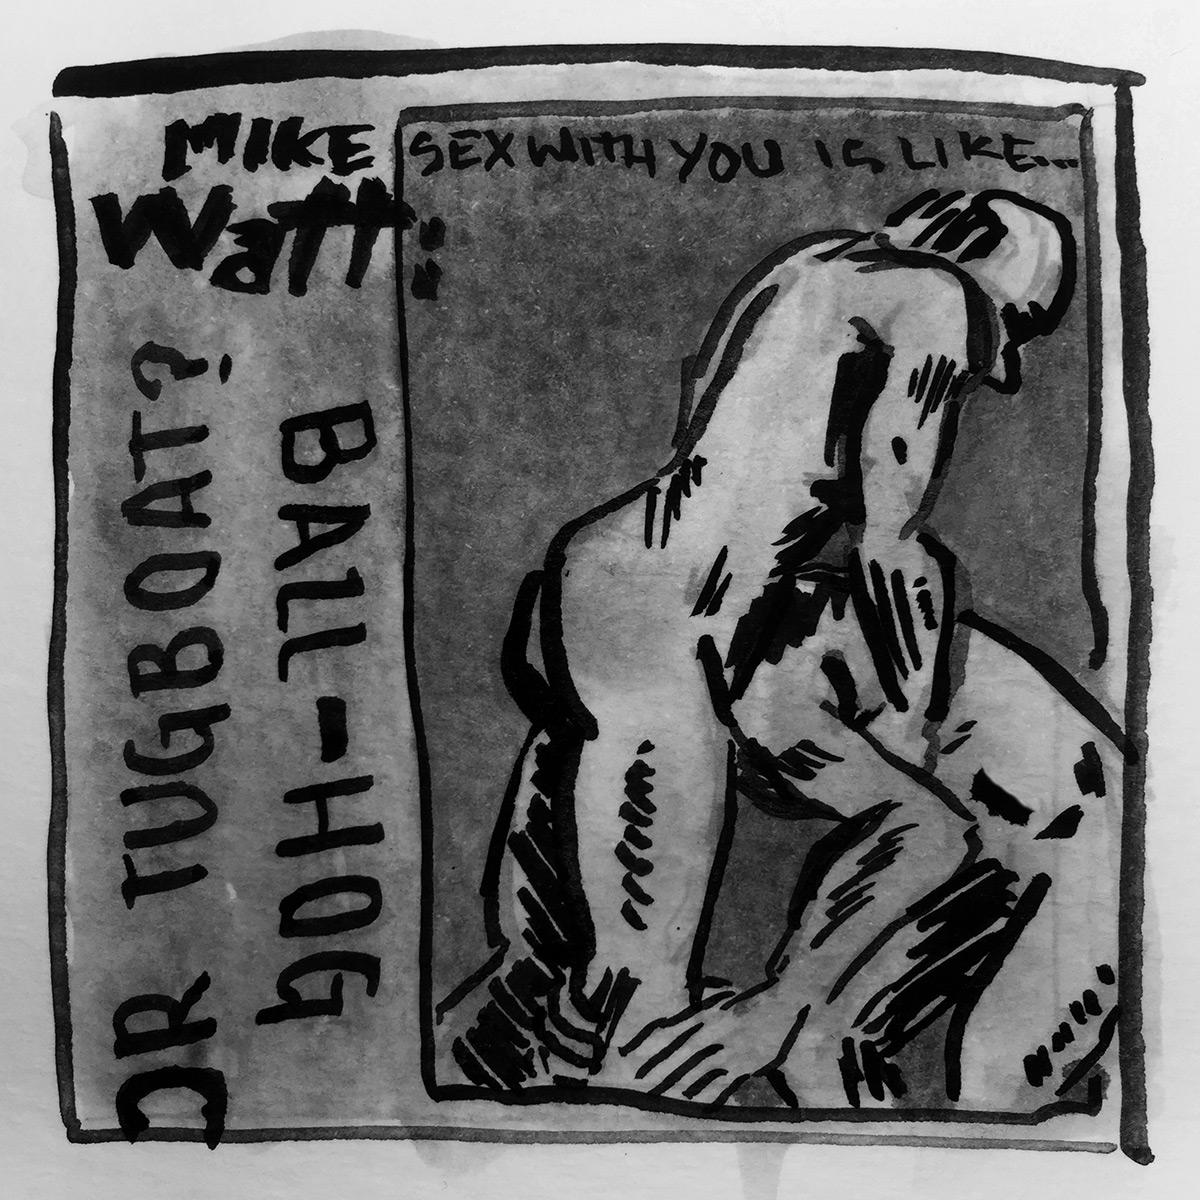 Mike Watt Ballhog or Tugboat